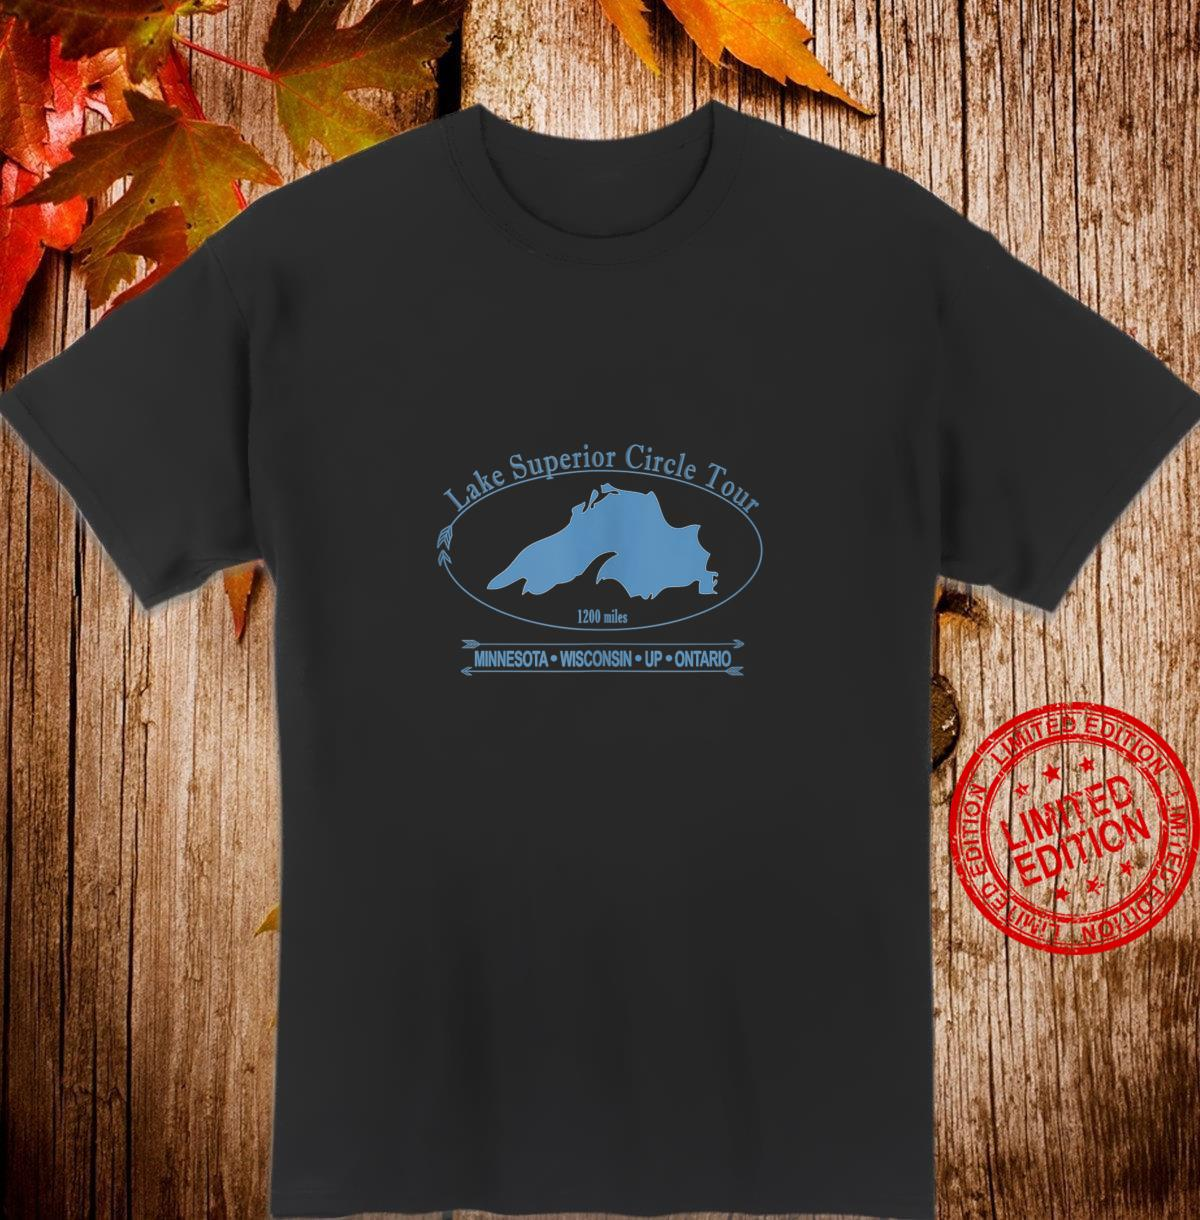 Lake Superior Circle Tour Minnesota, Wisconsin, UP, Ontario Shirt